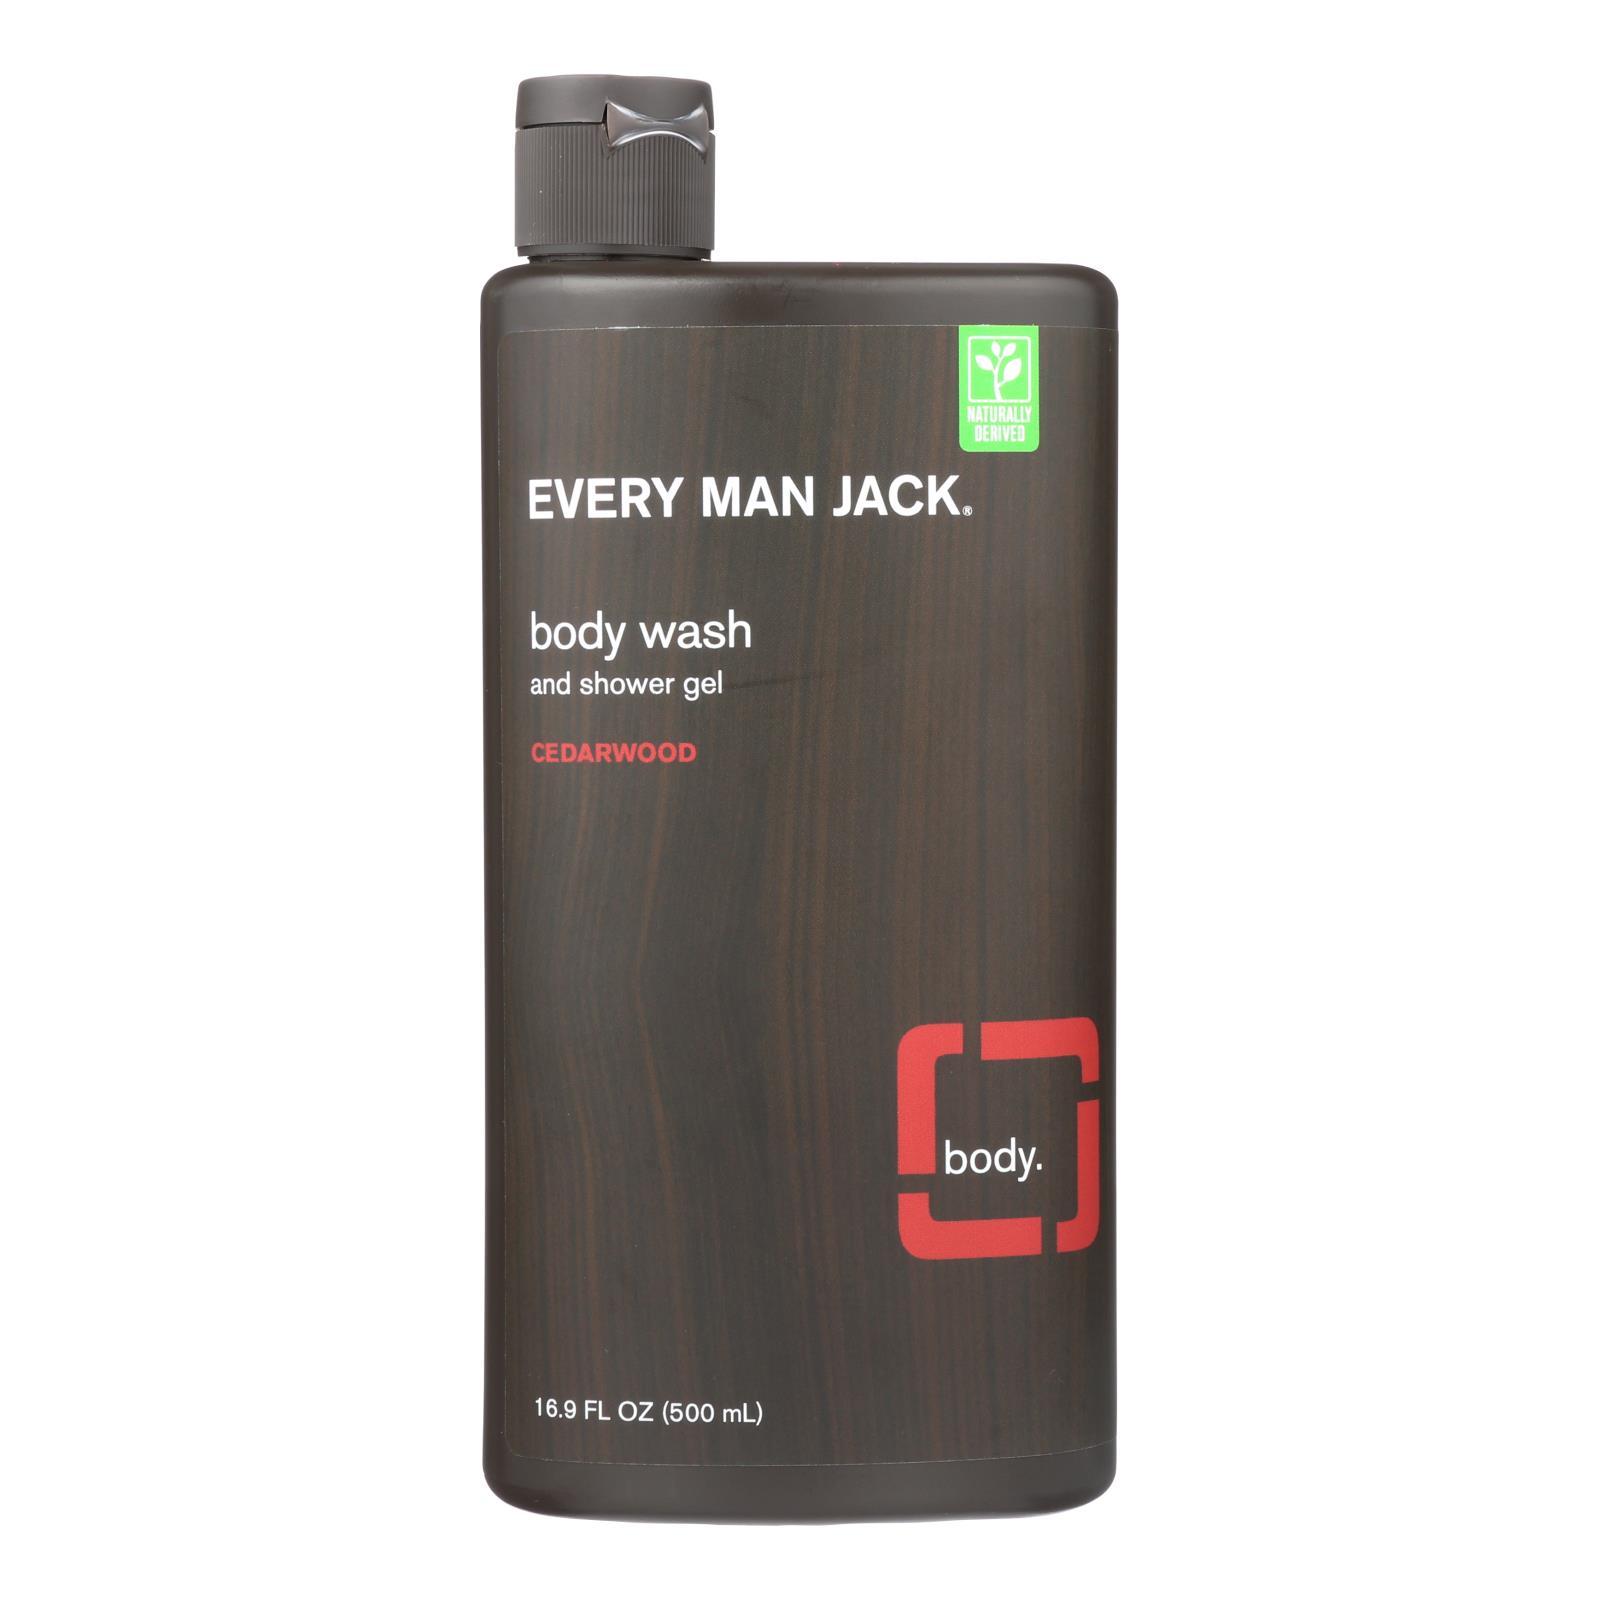 Every Man Jack Body Wash - Cedarwood - 16.9 oz